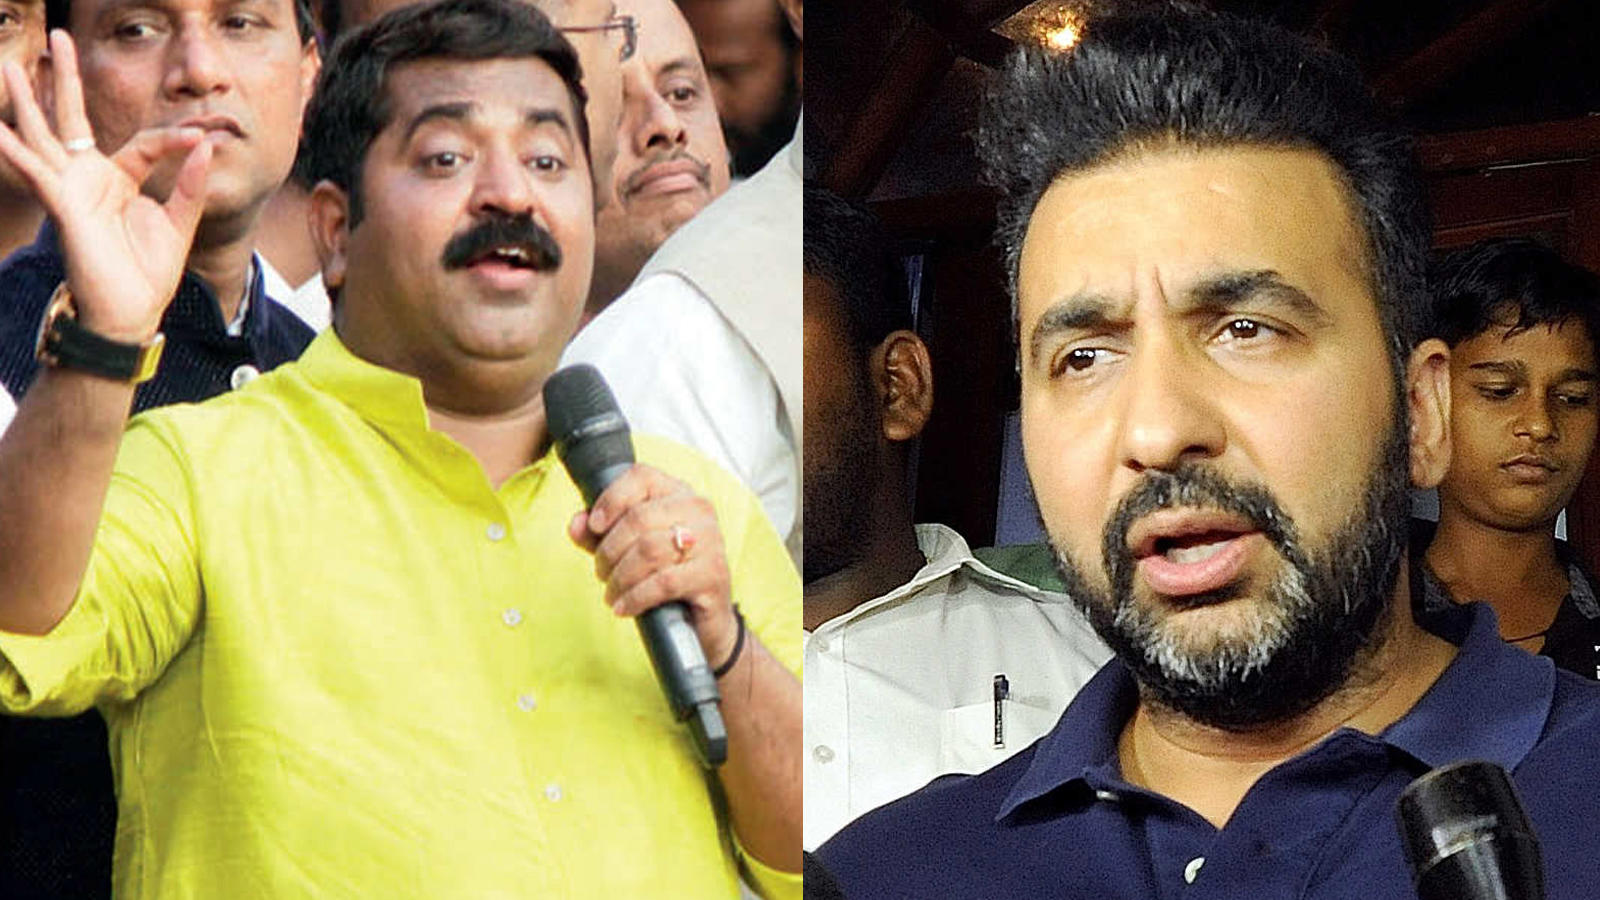 raj-kundra-scammed-people-of-almost-rs-3000-crore-claims-bjp-leader-ram-kadam